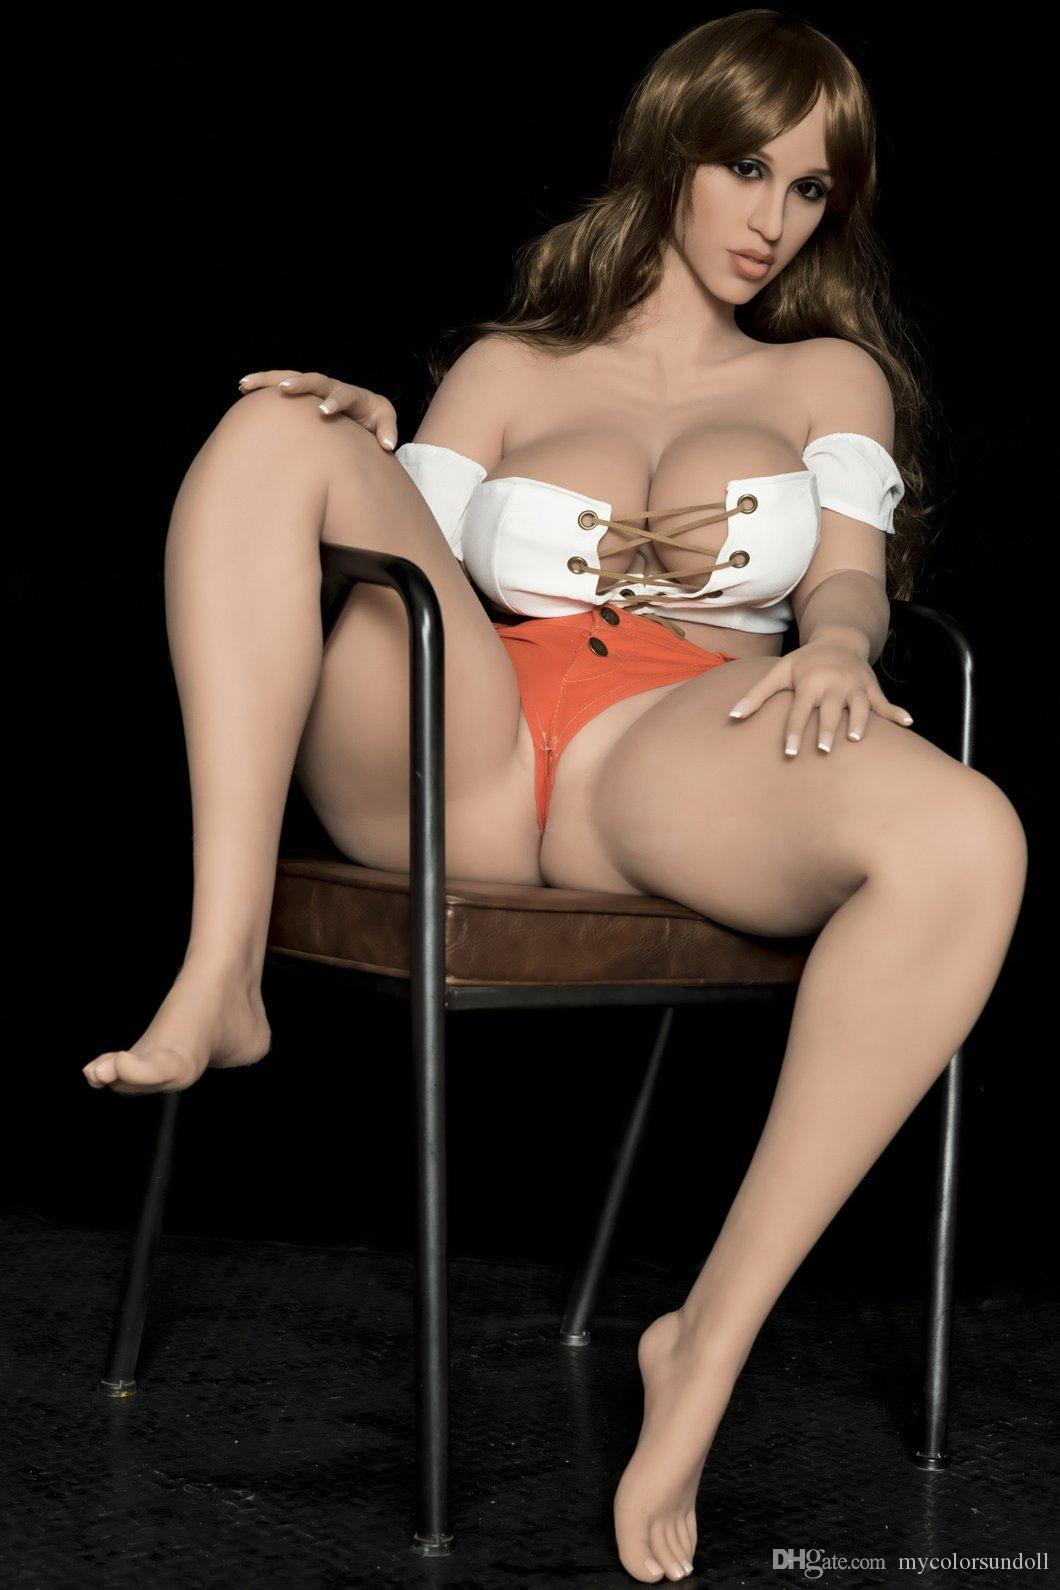 3D Big Tits Anal new 163cm real sex doll big butts big tits chubby ass lifelike 3d vagina  anal oral sex holes dollsex realistic dolls from mycolorsundoll, $304.57|